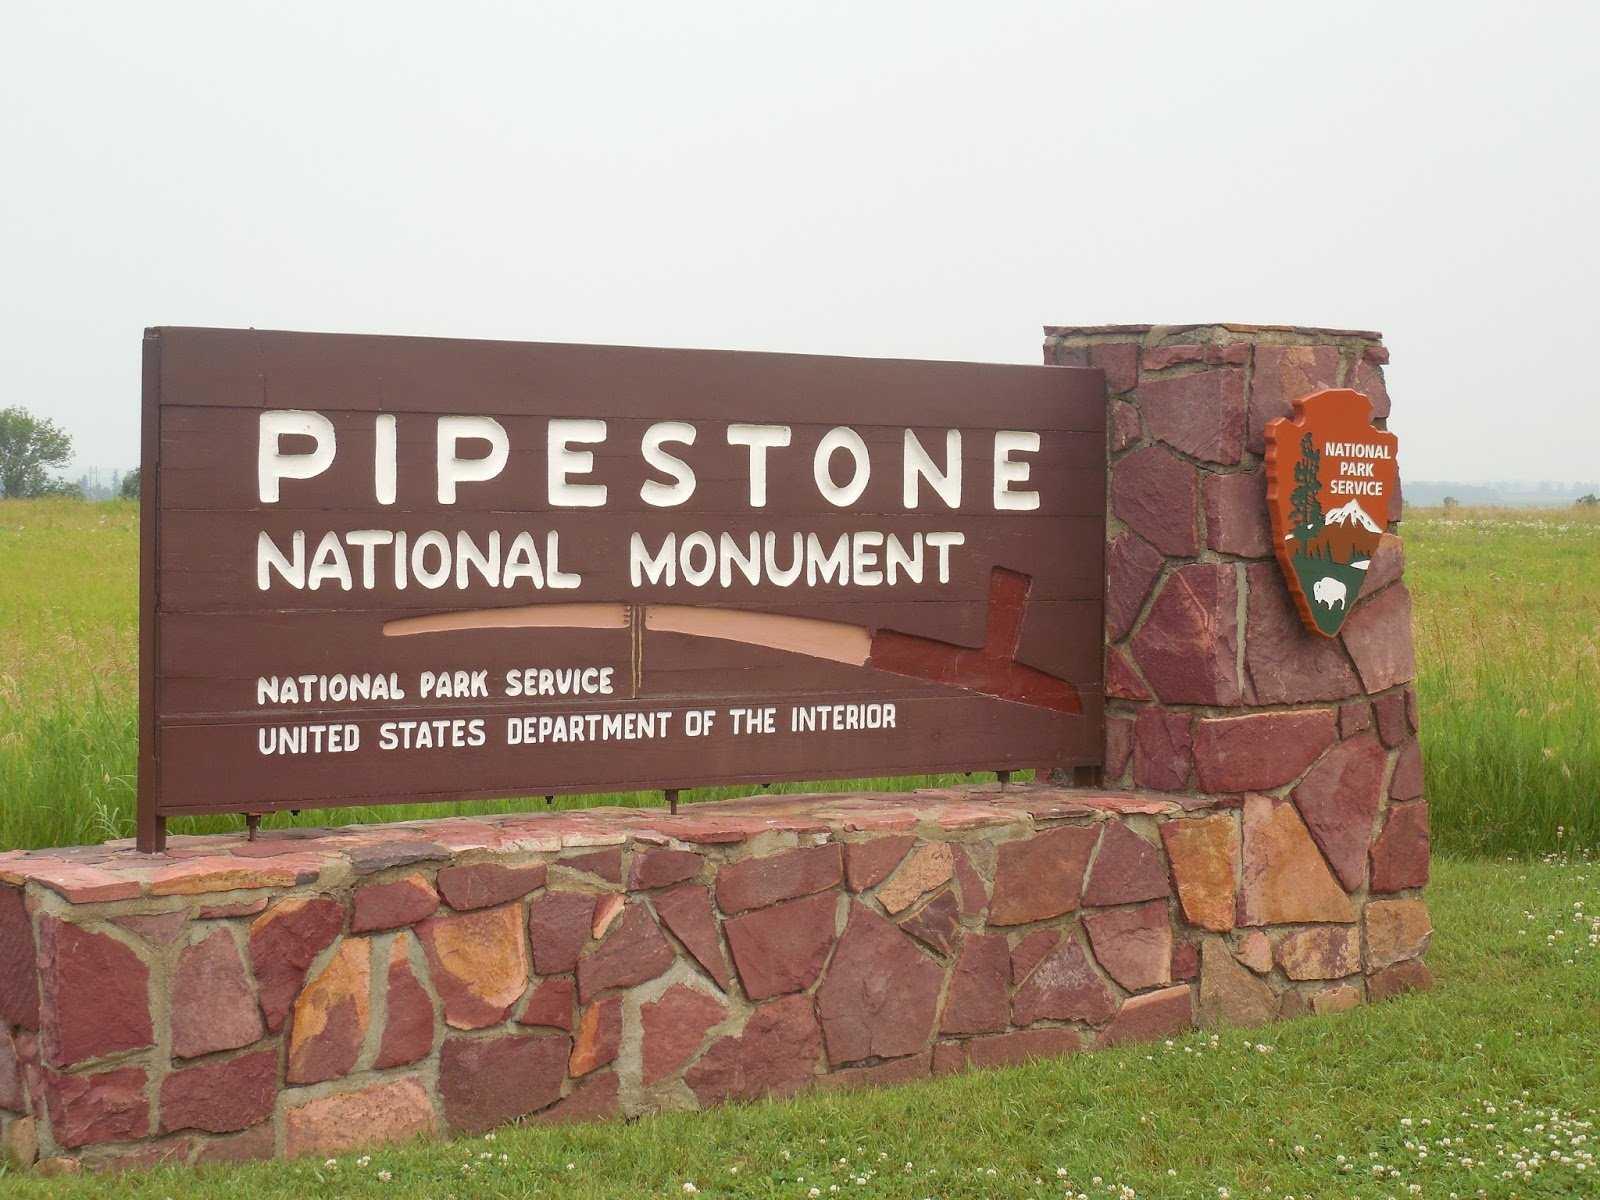 DSCN2688 - Pipestone National Monument - Minnesota - Pleasantly surprising